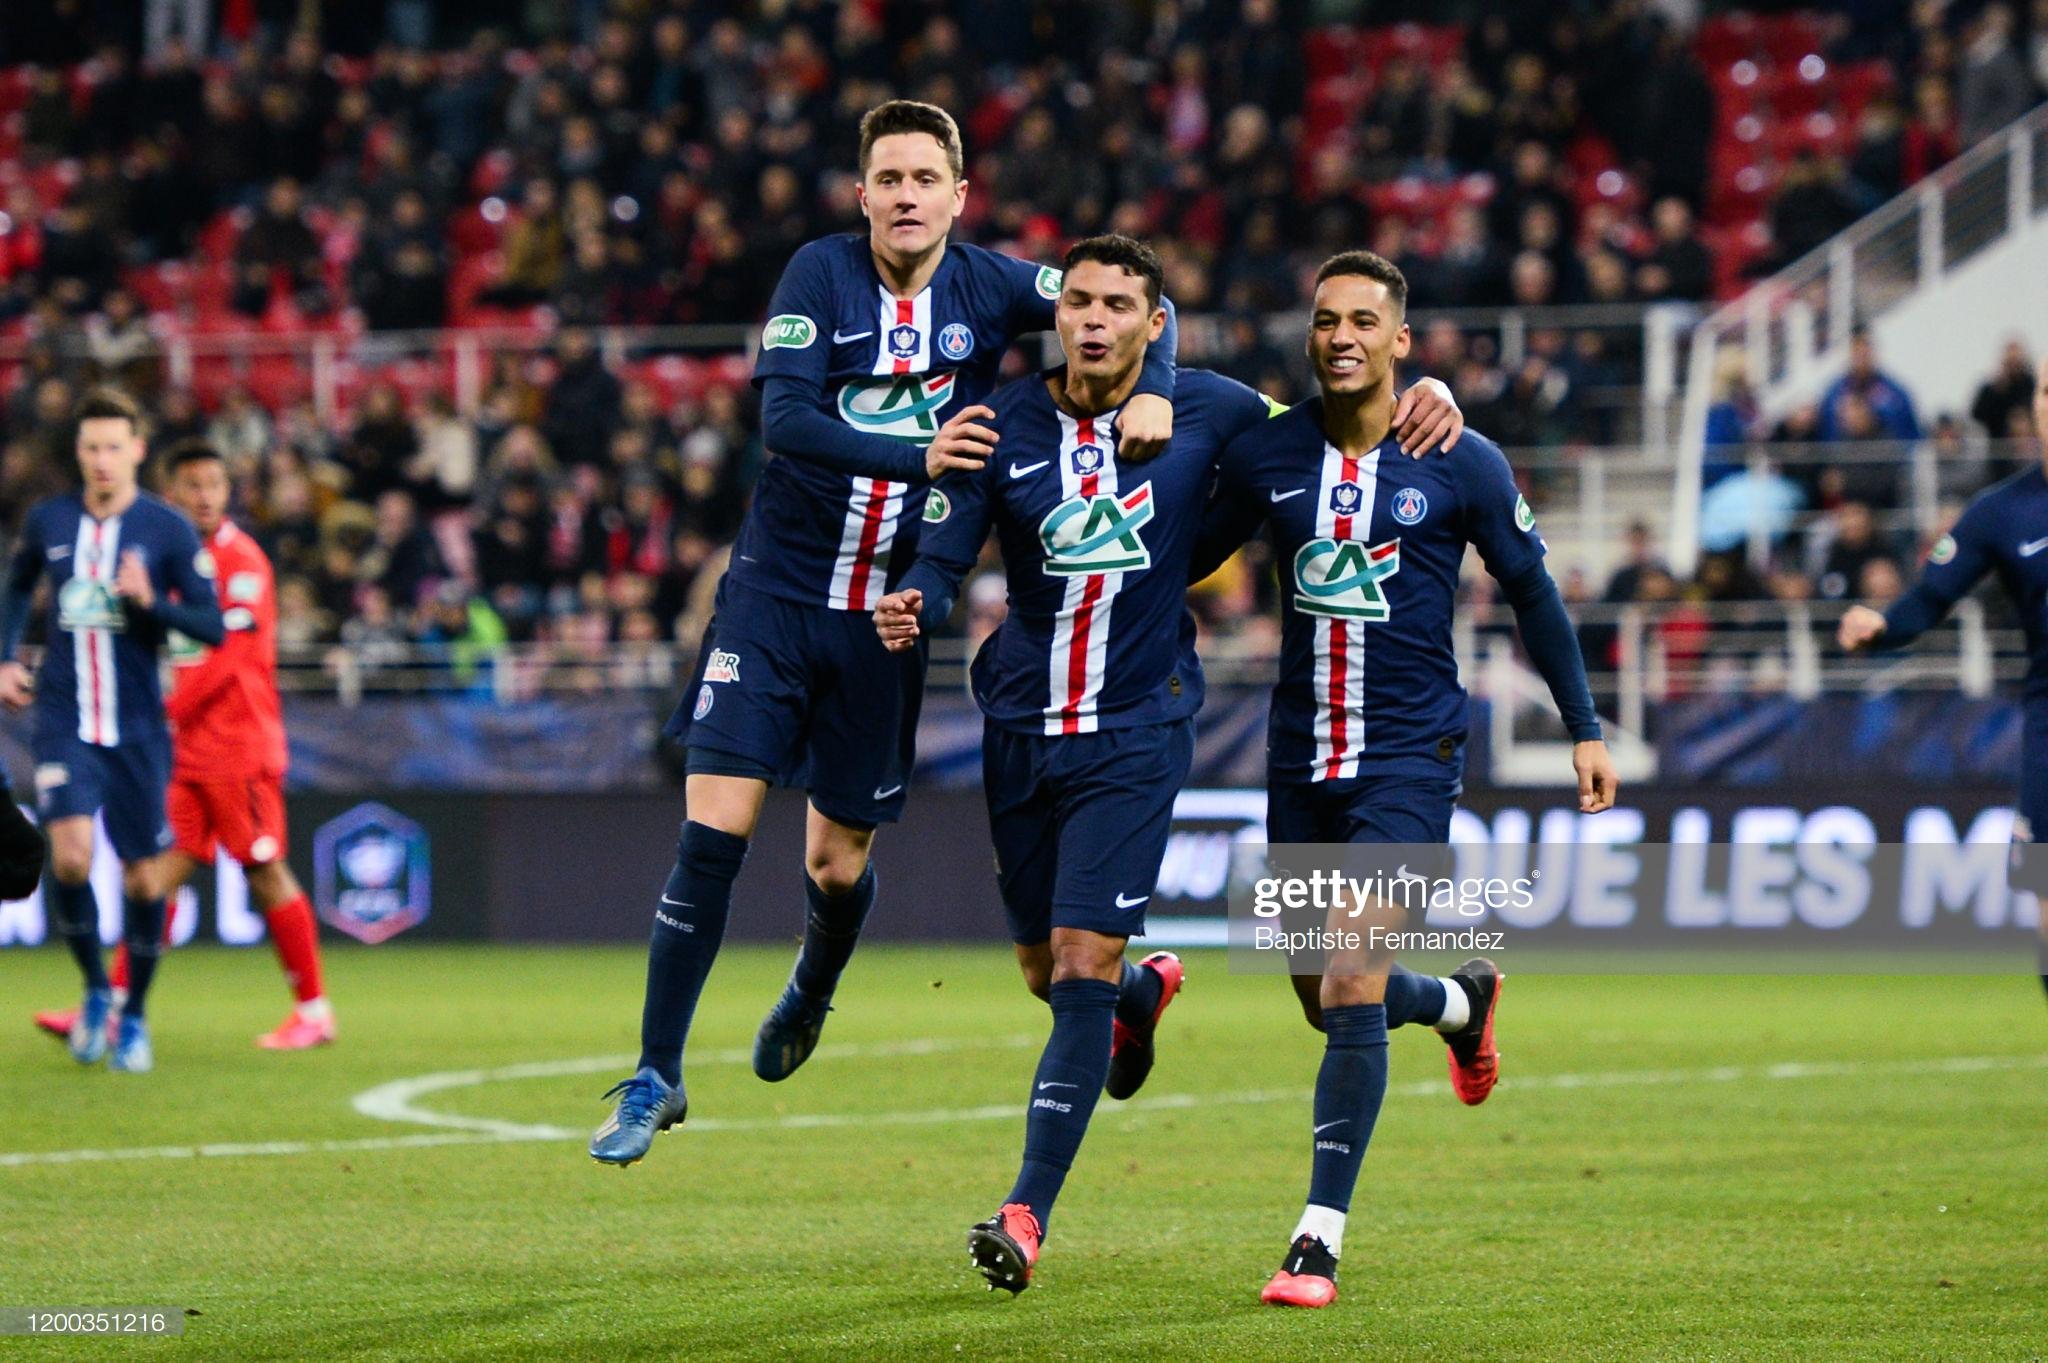 La victoire en chiffres — PSG v Lyon